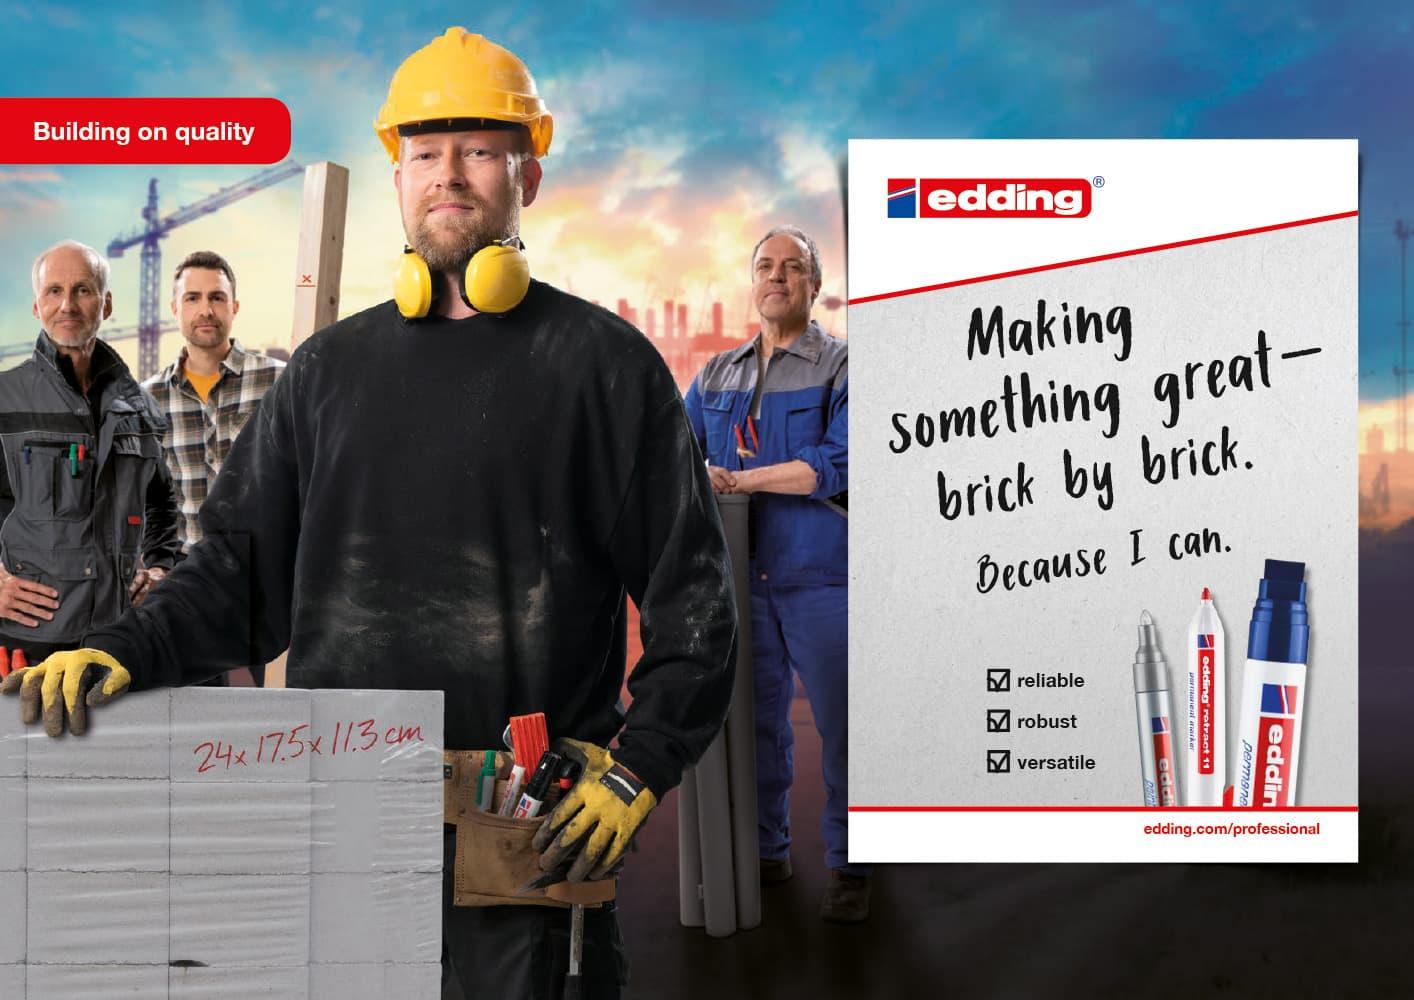 edding Craftsmen Kampagne Motiv Bauarbeiter Querformat Rückemänner Werbeagentur Hamburg